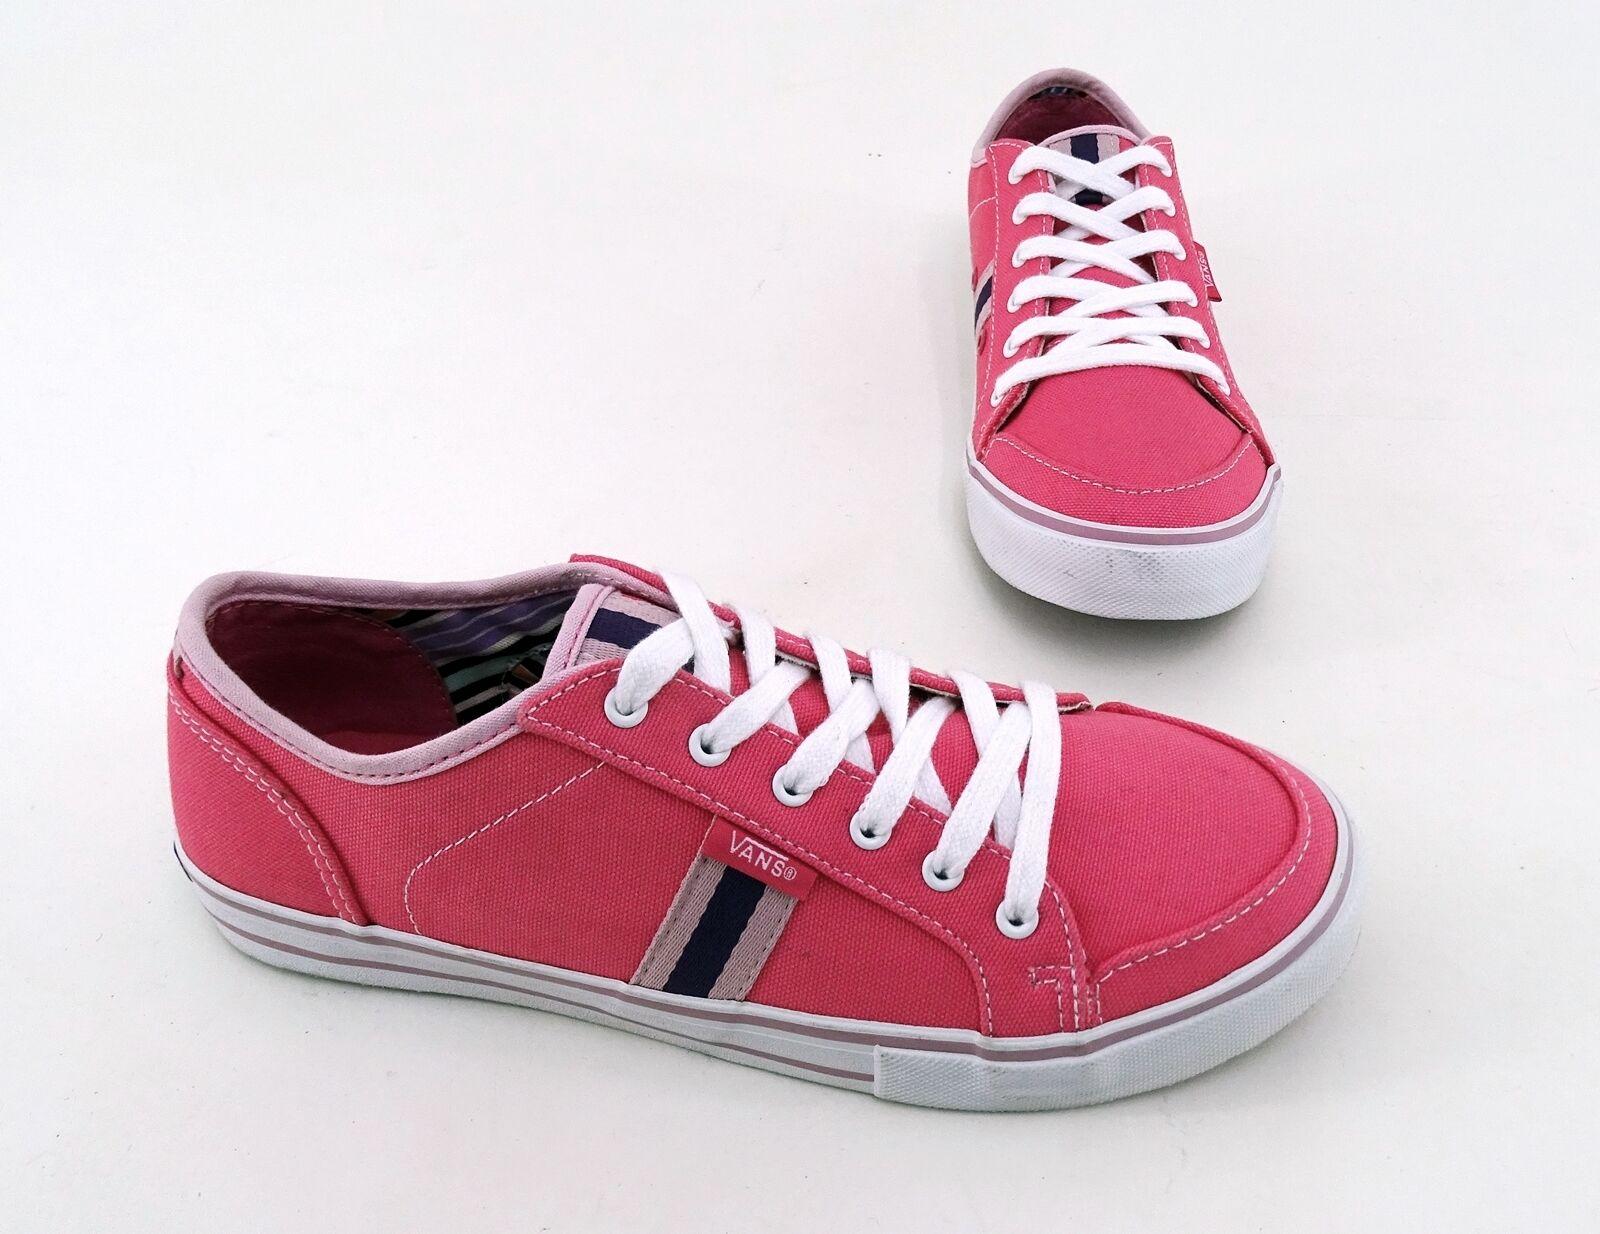 Sneaker VANS Halbschuhe Schnürer Textil pink pink Gr. 37